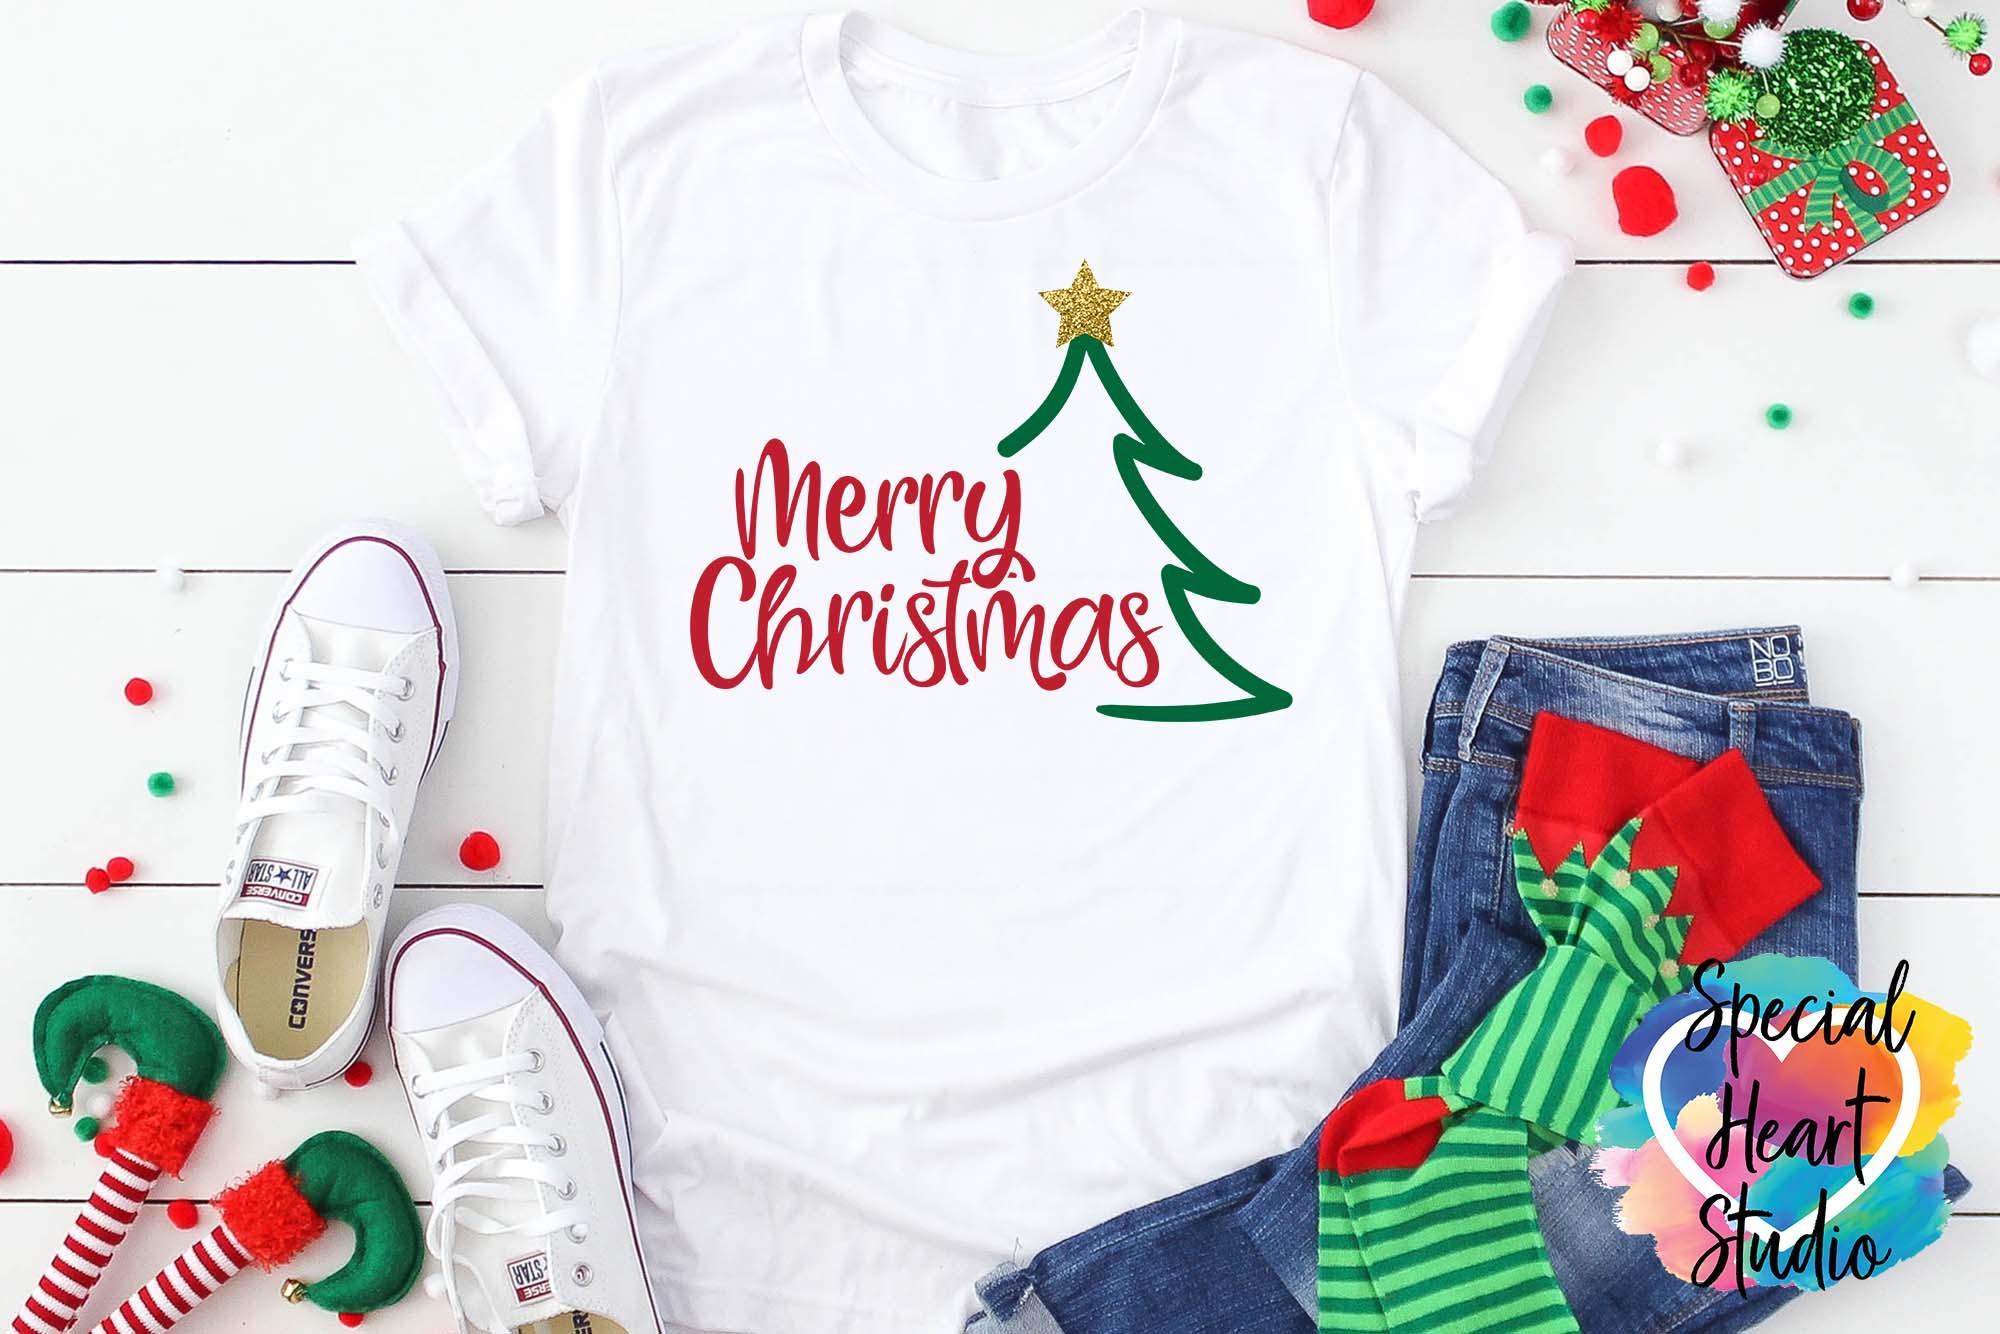 Christmas SVG Bundle - A Christmas Shirt SVG Cut File Bundle example image 8